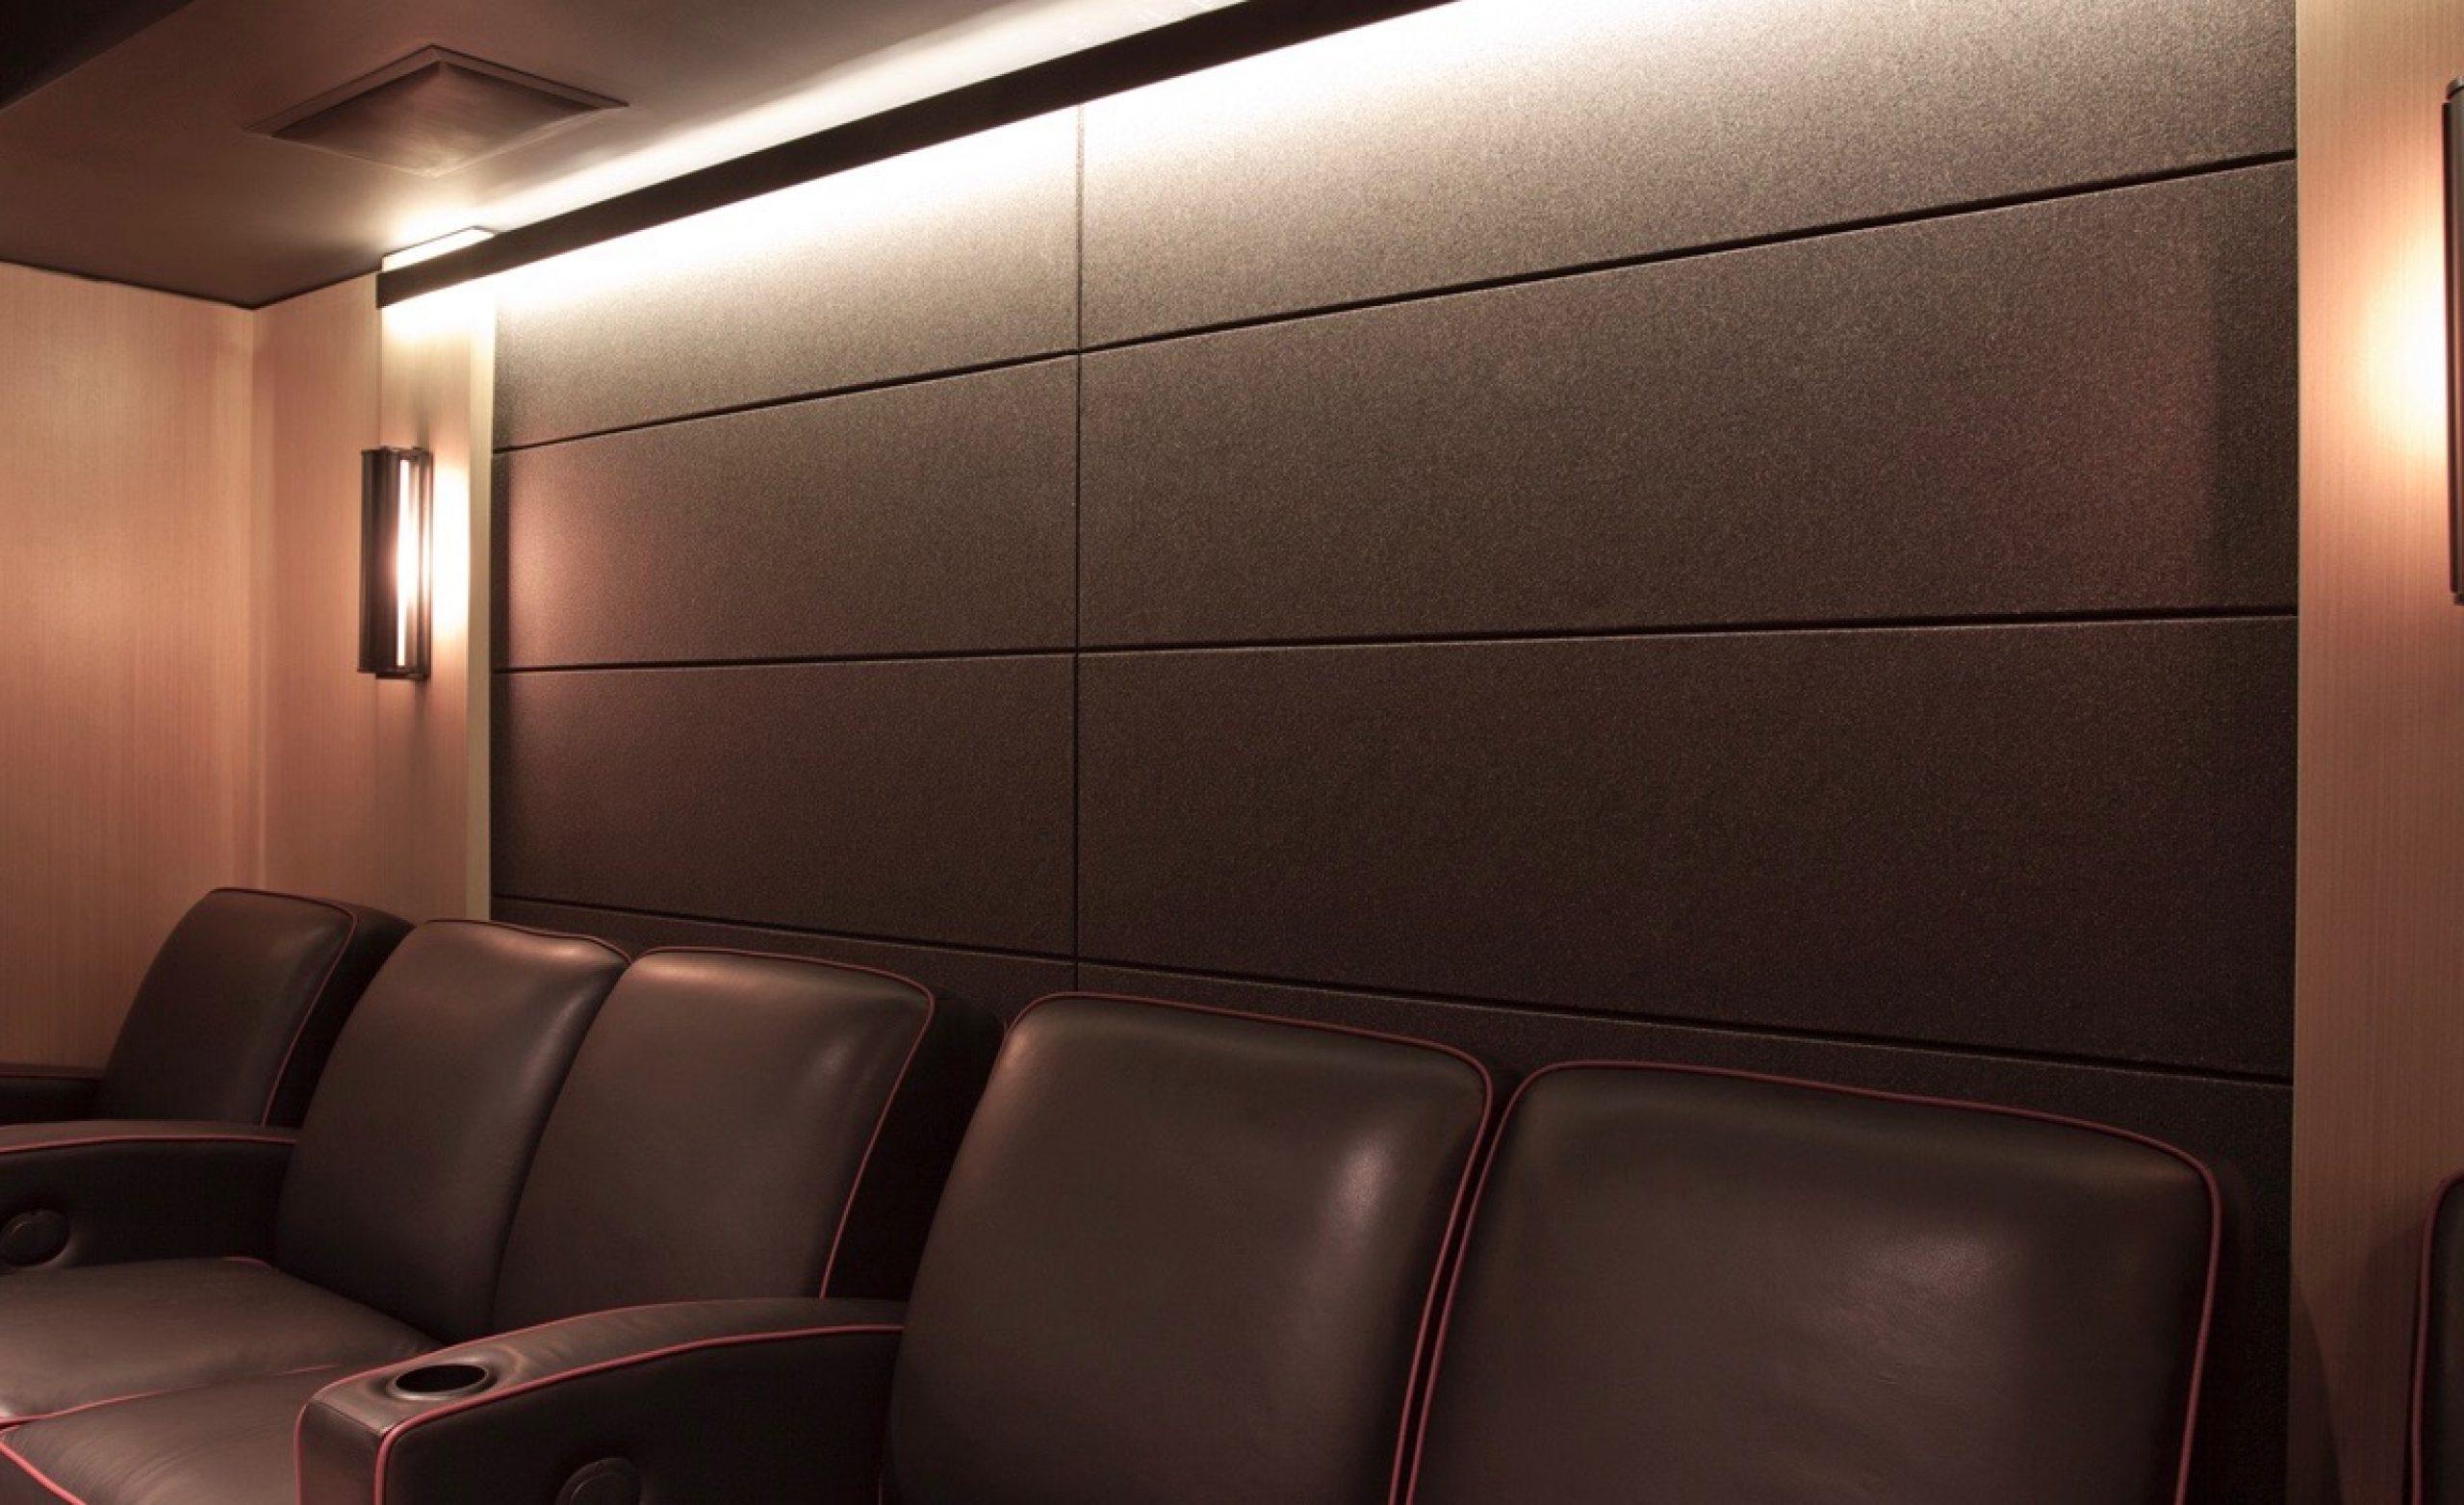 jaffea+i-Private-Screenings-sound-deadening-panel